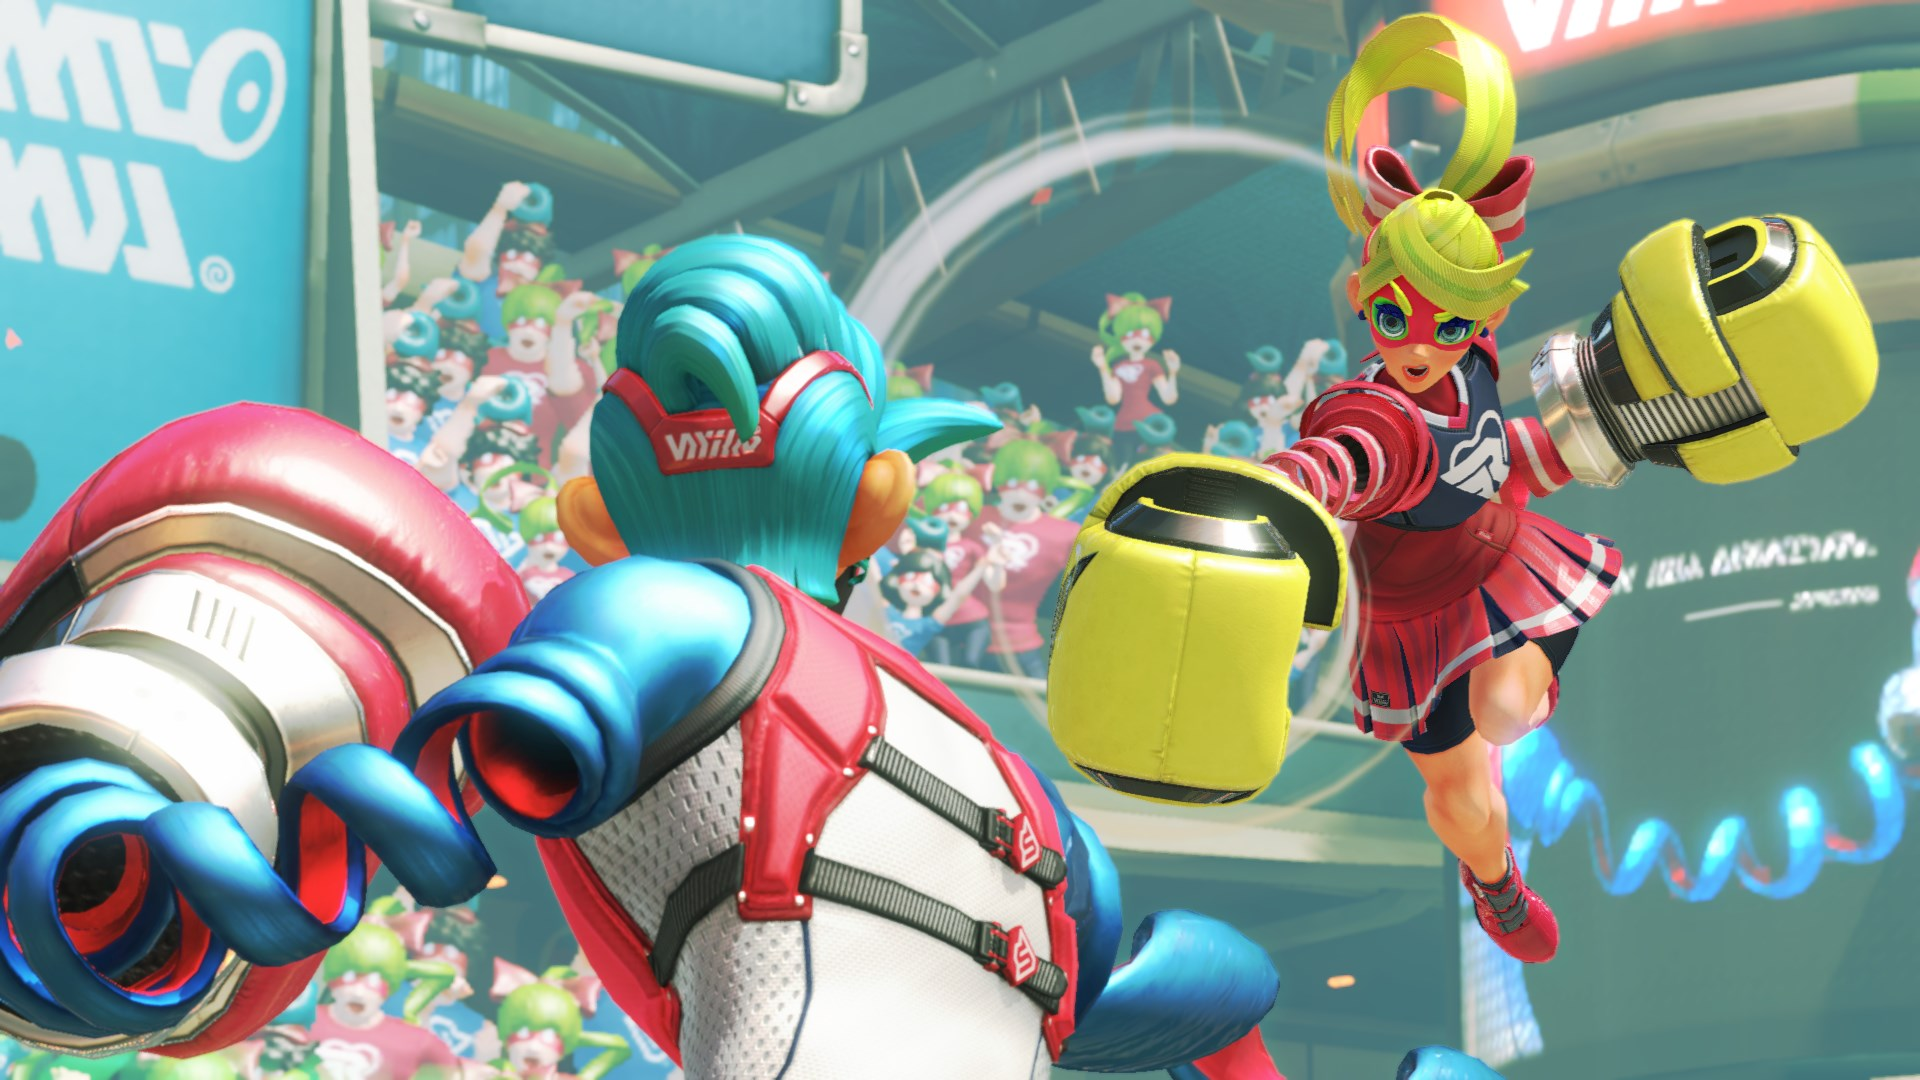 Arms: Nintendo Switch